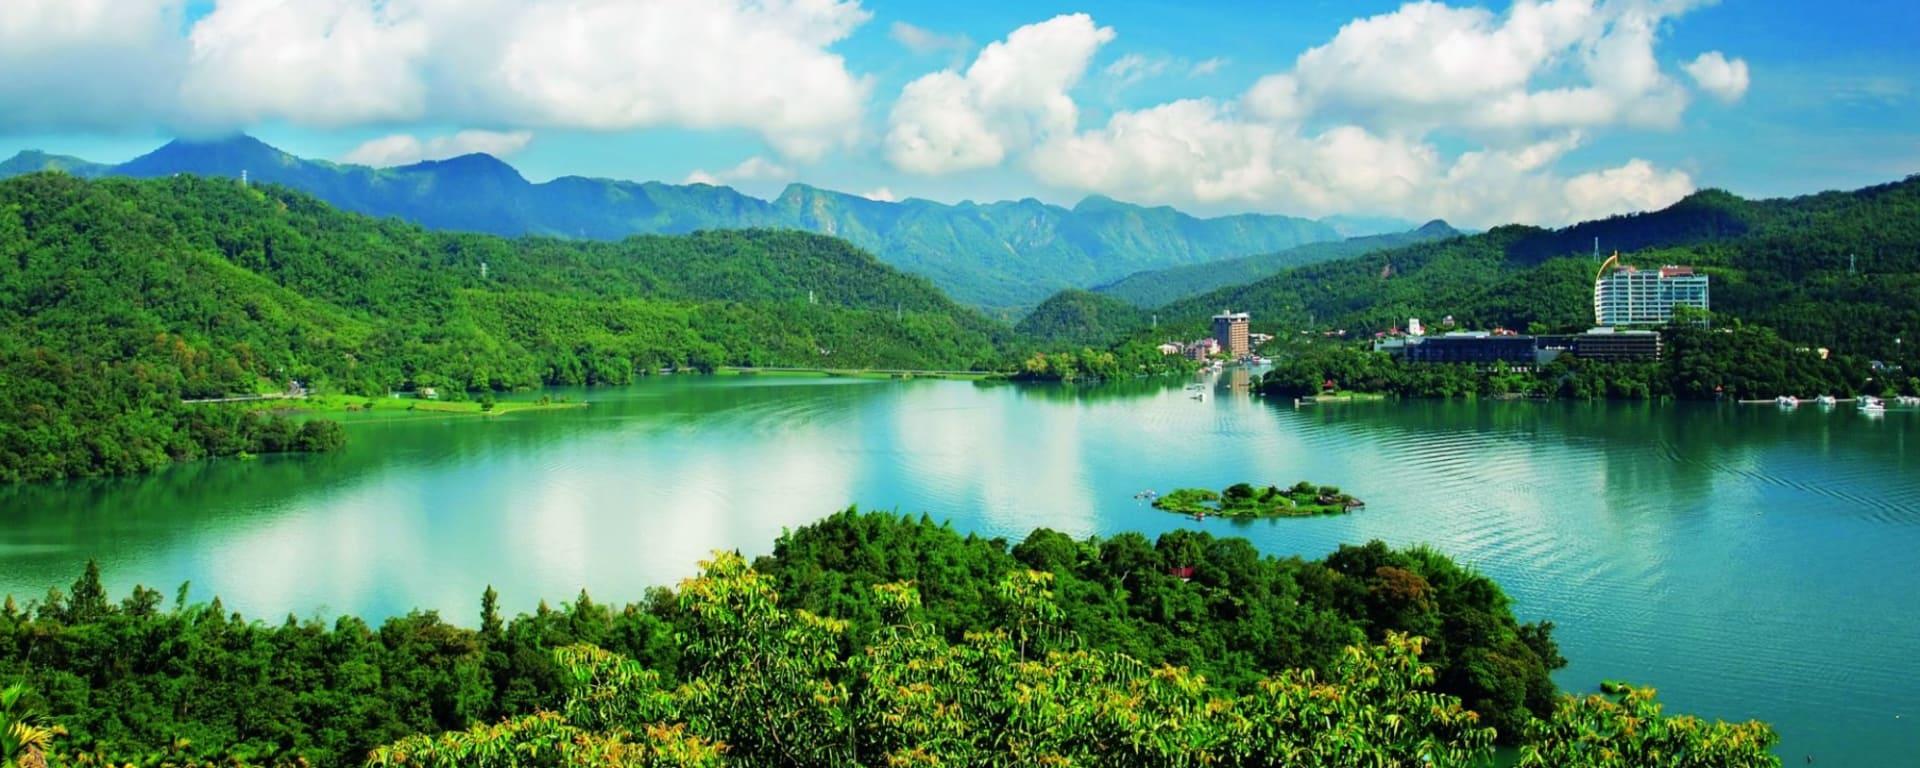 Voyages en Taïwan | Vacances en Asie par tourasia: Sun Moon Lake: